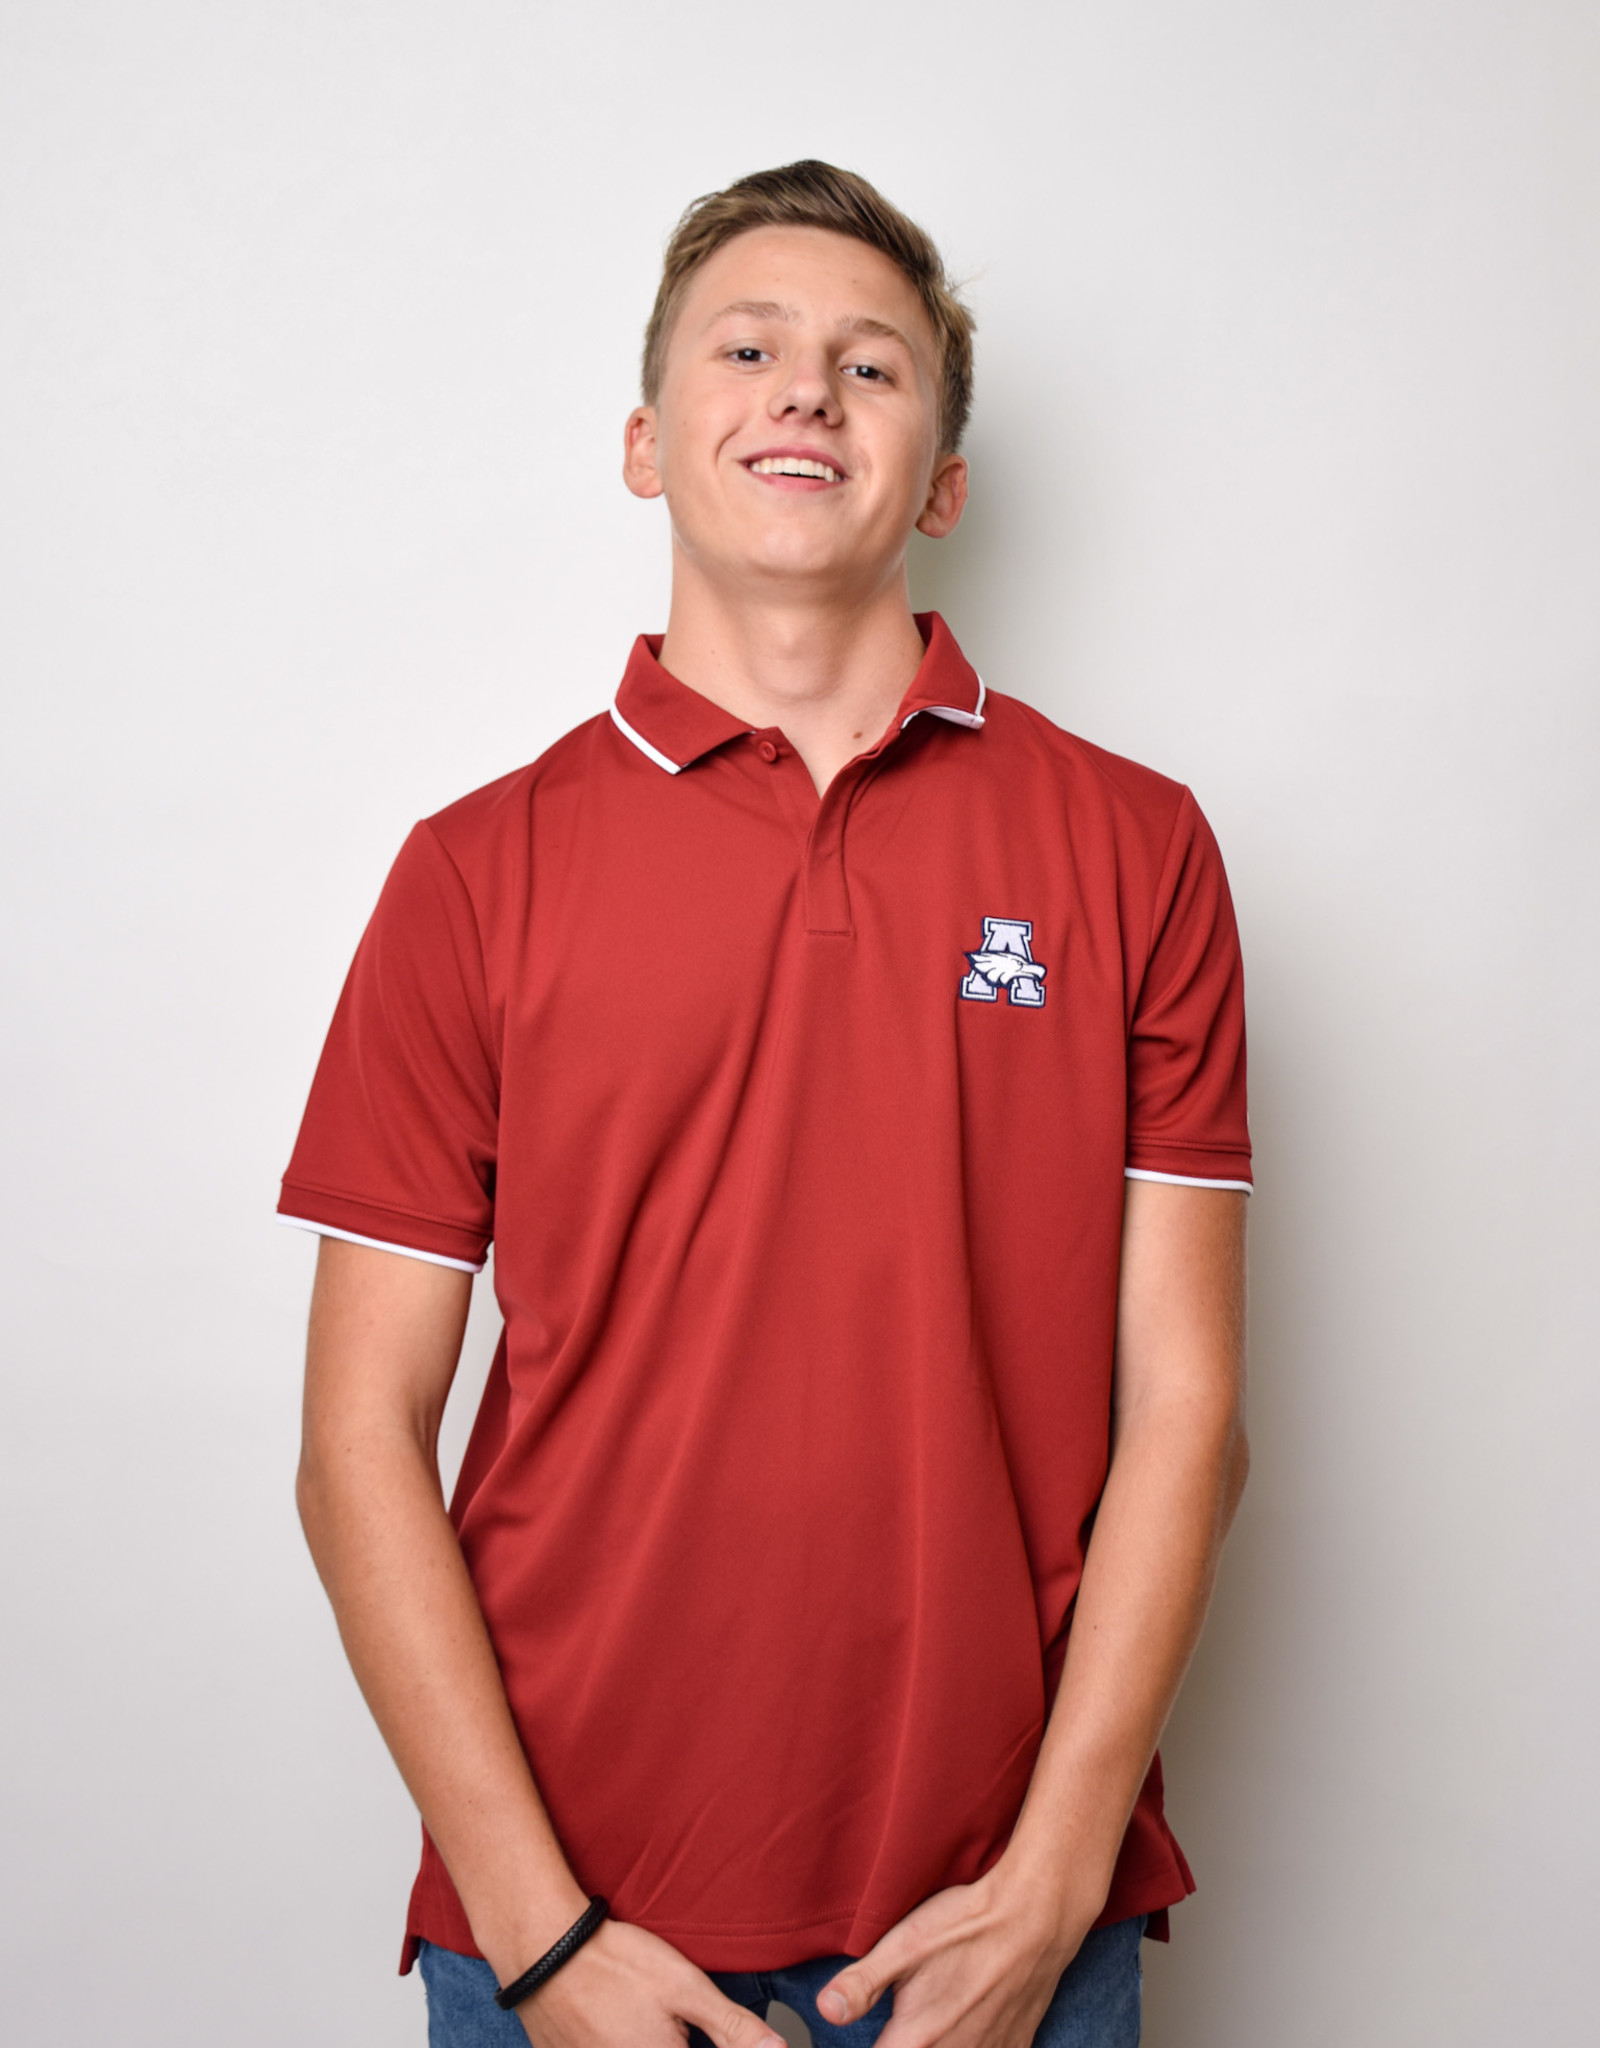 Nike UV Collegiate polo -crimson (large)